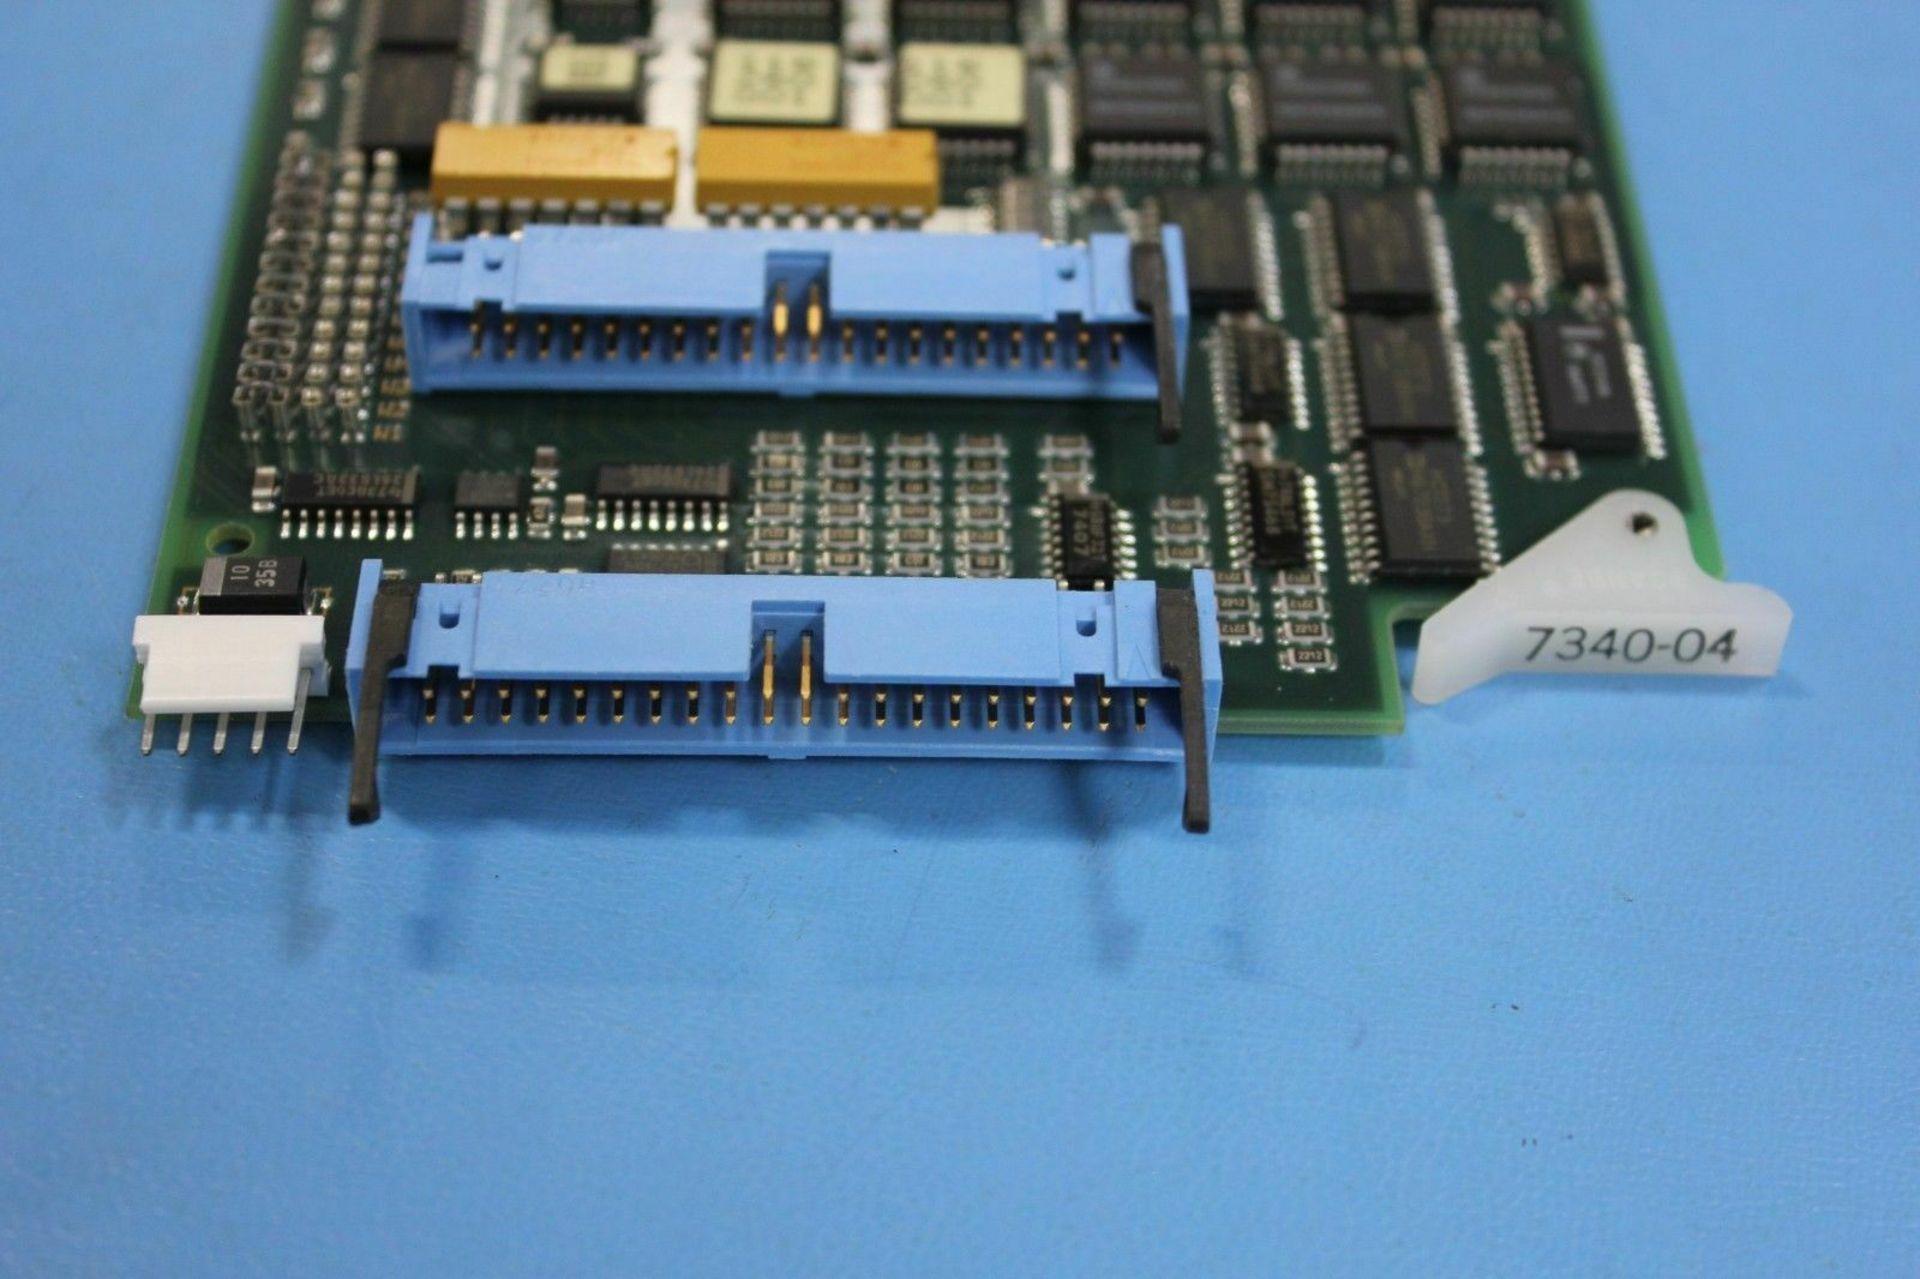 UNUSED PROLOG STD BUS SERVO CONTROLLER PC BOARD - Image 3 of 5